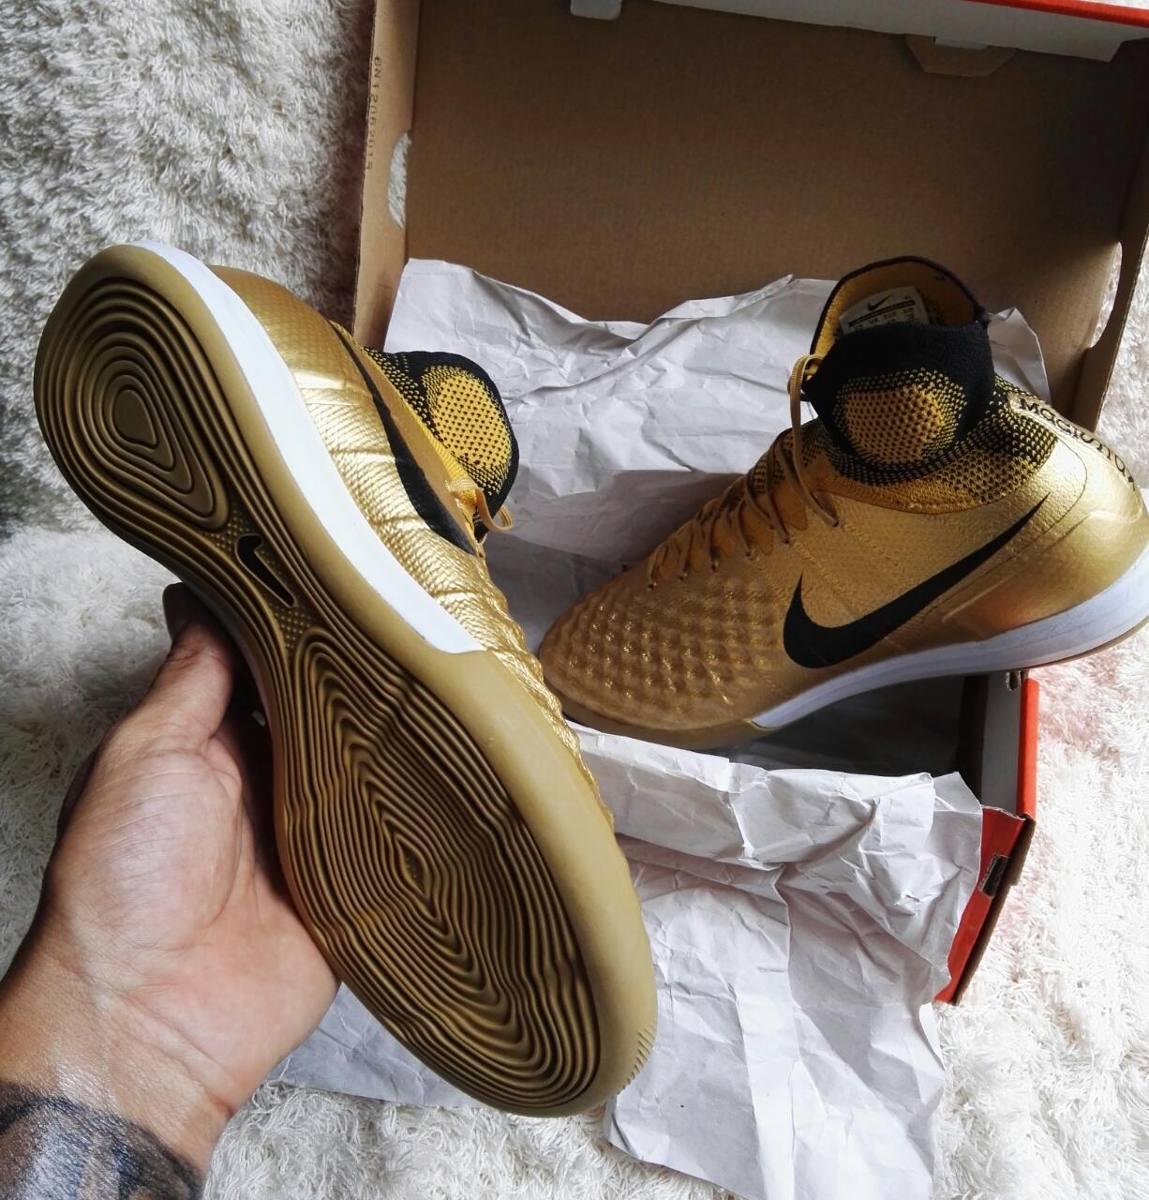 Tenis Zapatillas Nike Zoom Both Botas Dama -   210.000 en Mercado Libre 27655e7fe443b